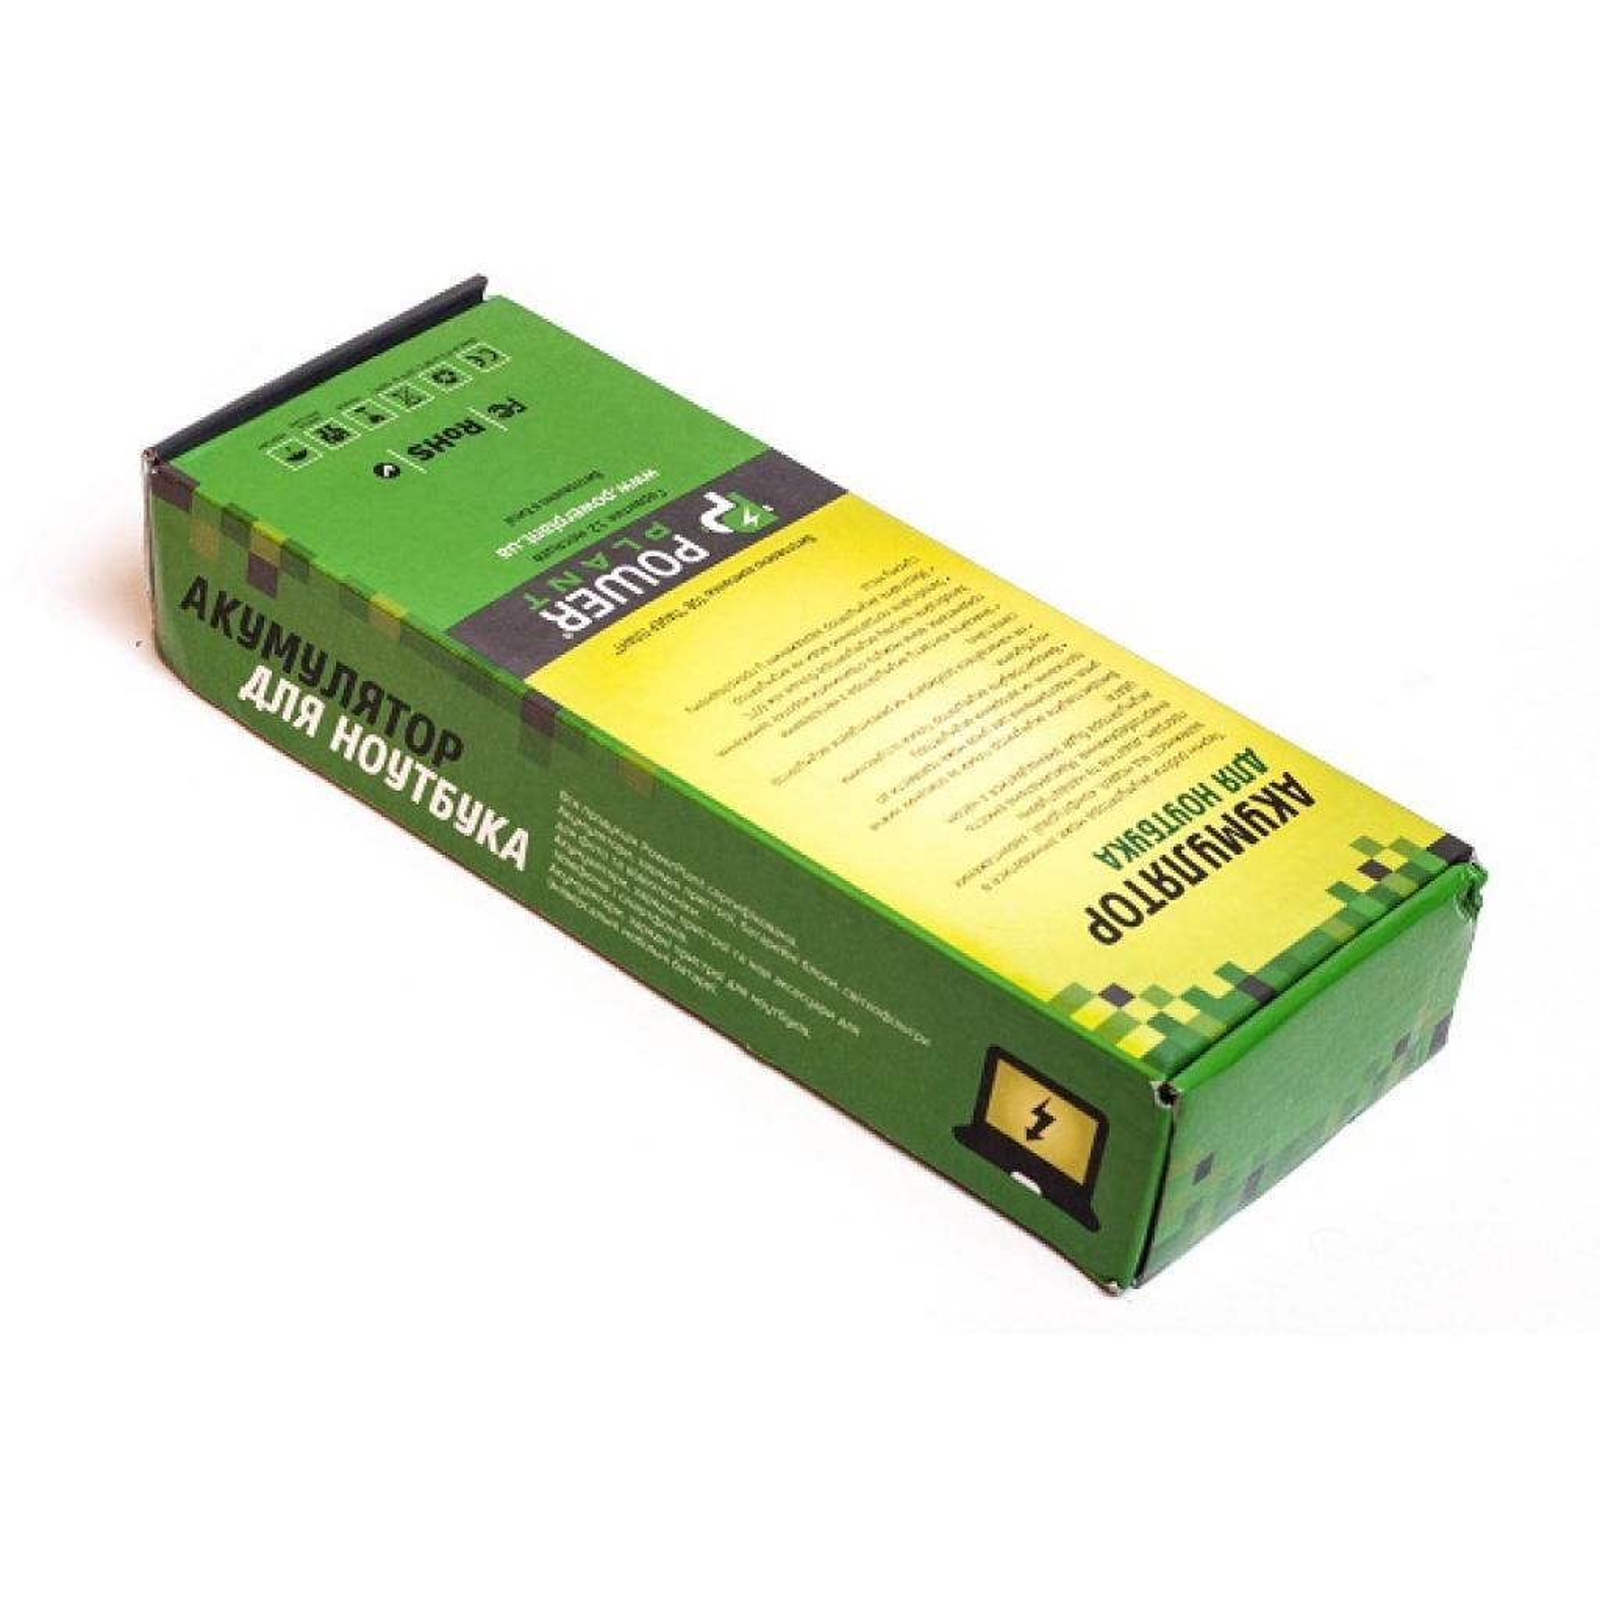 Аккумулятор для ноутбука LENOVO S10 (L08C3B21, LO8322LH) 11.1V 5200mAh PowerPlant (NB00000131) изображение 2